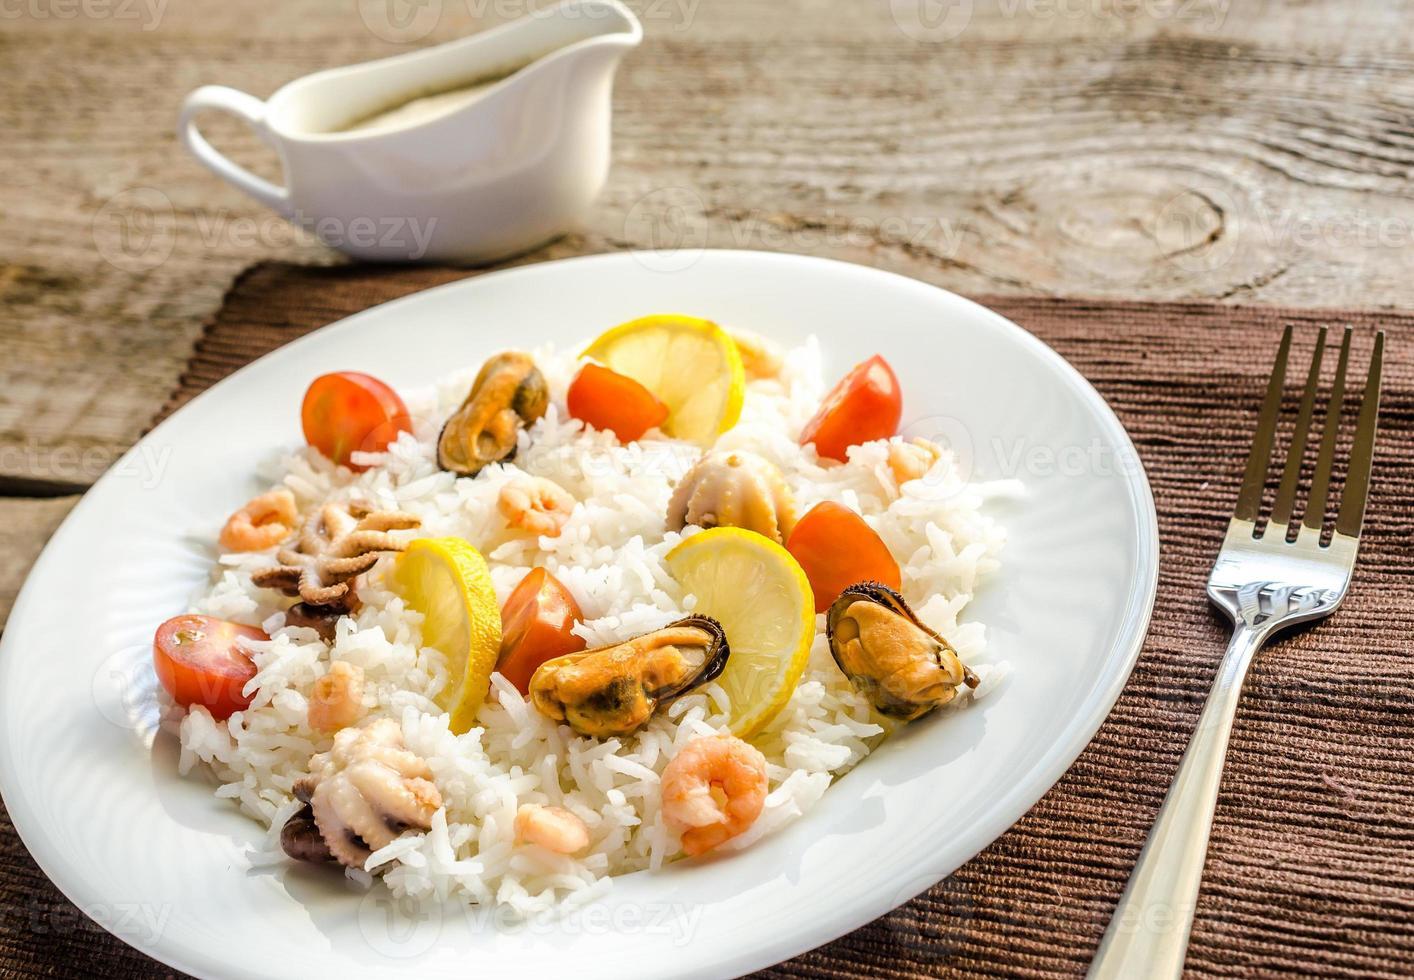 riz basmati aux fruits de mer photo